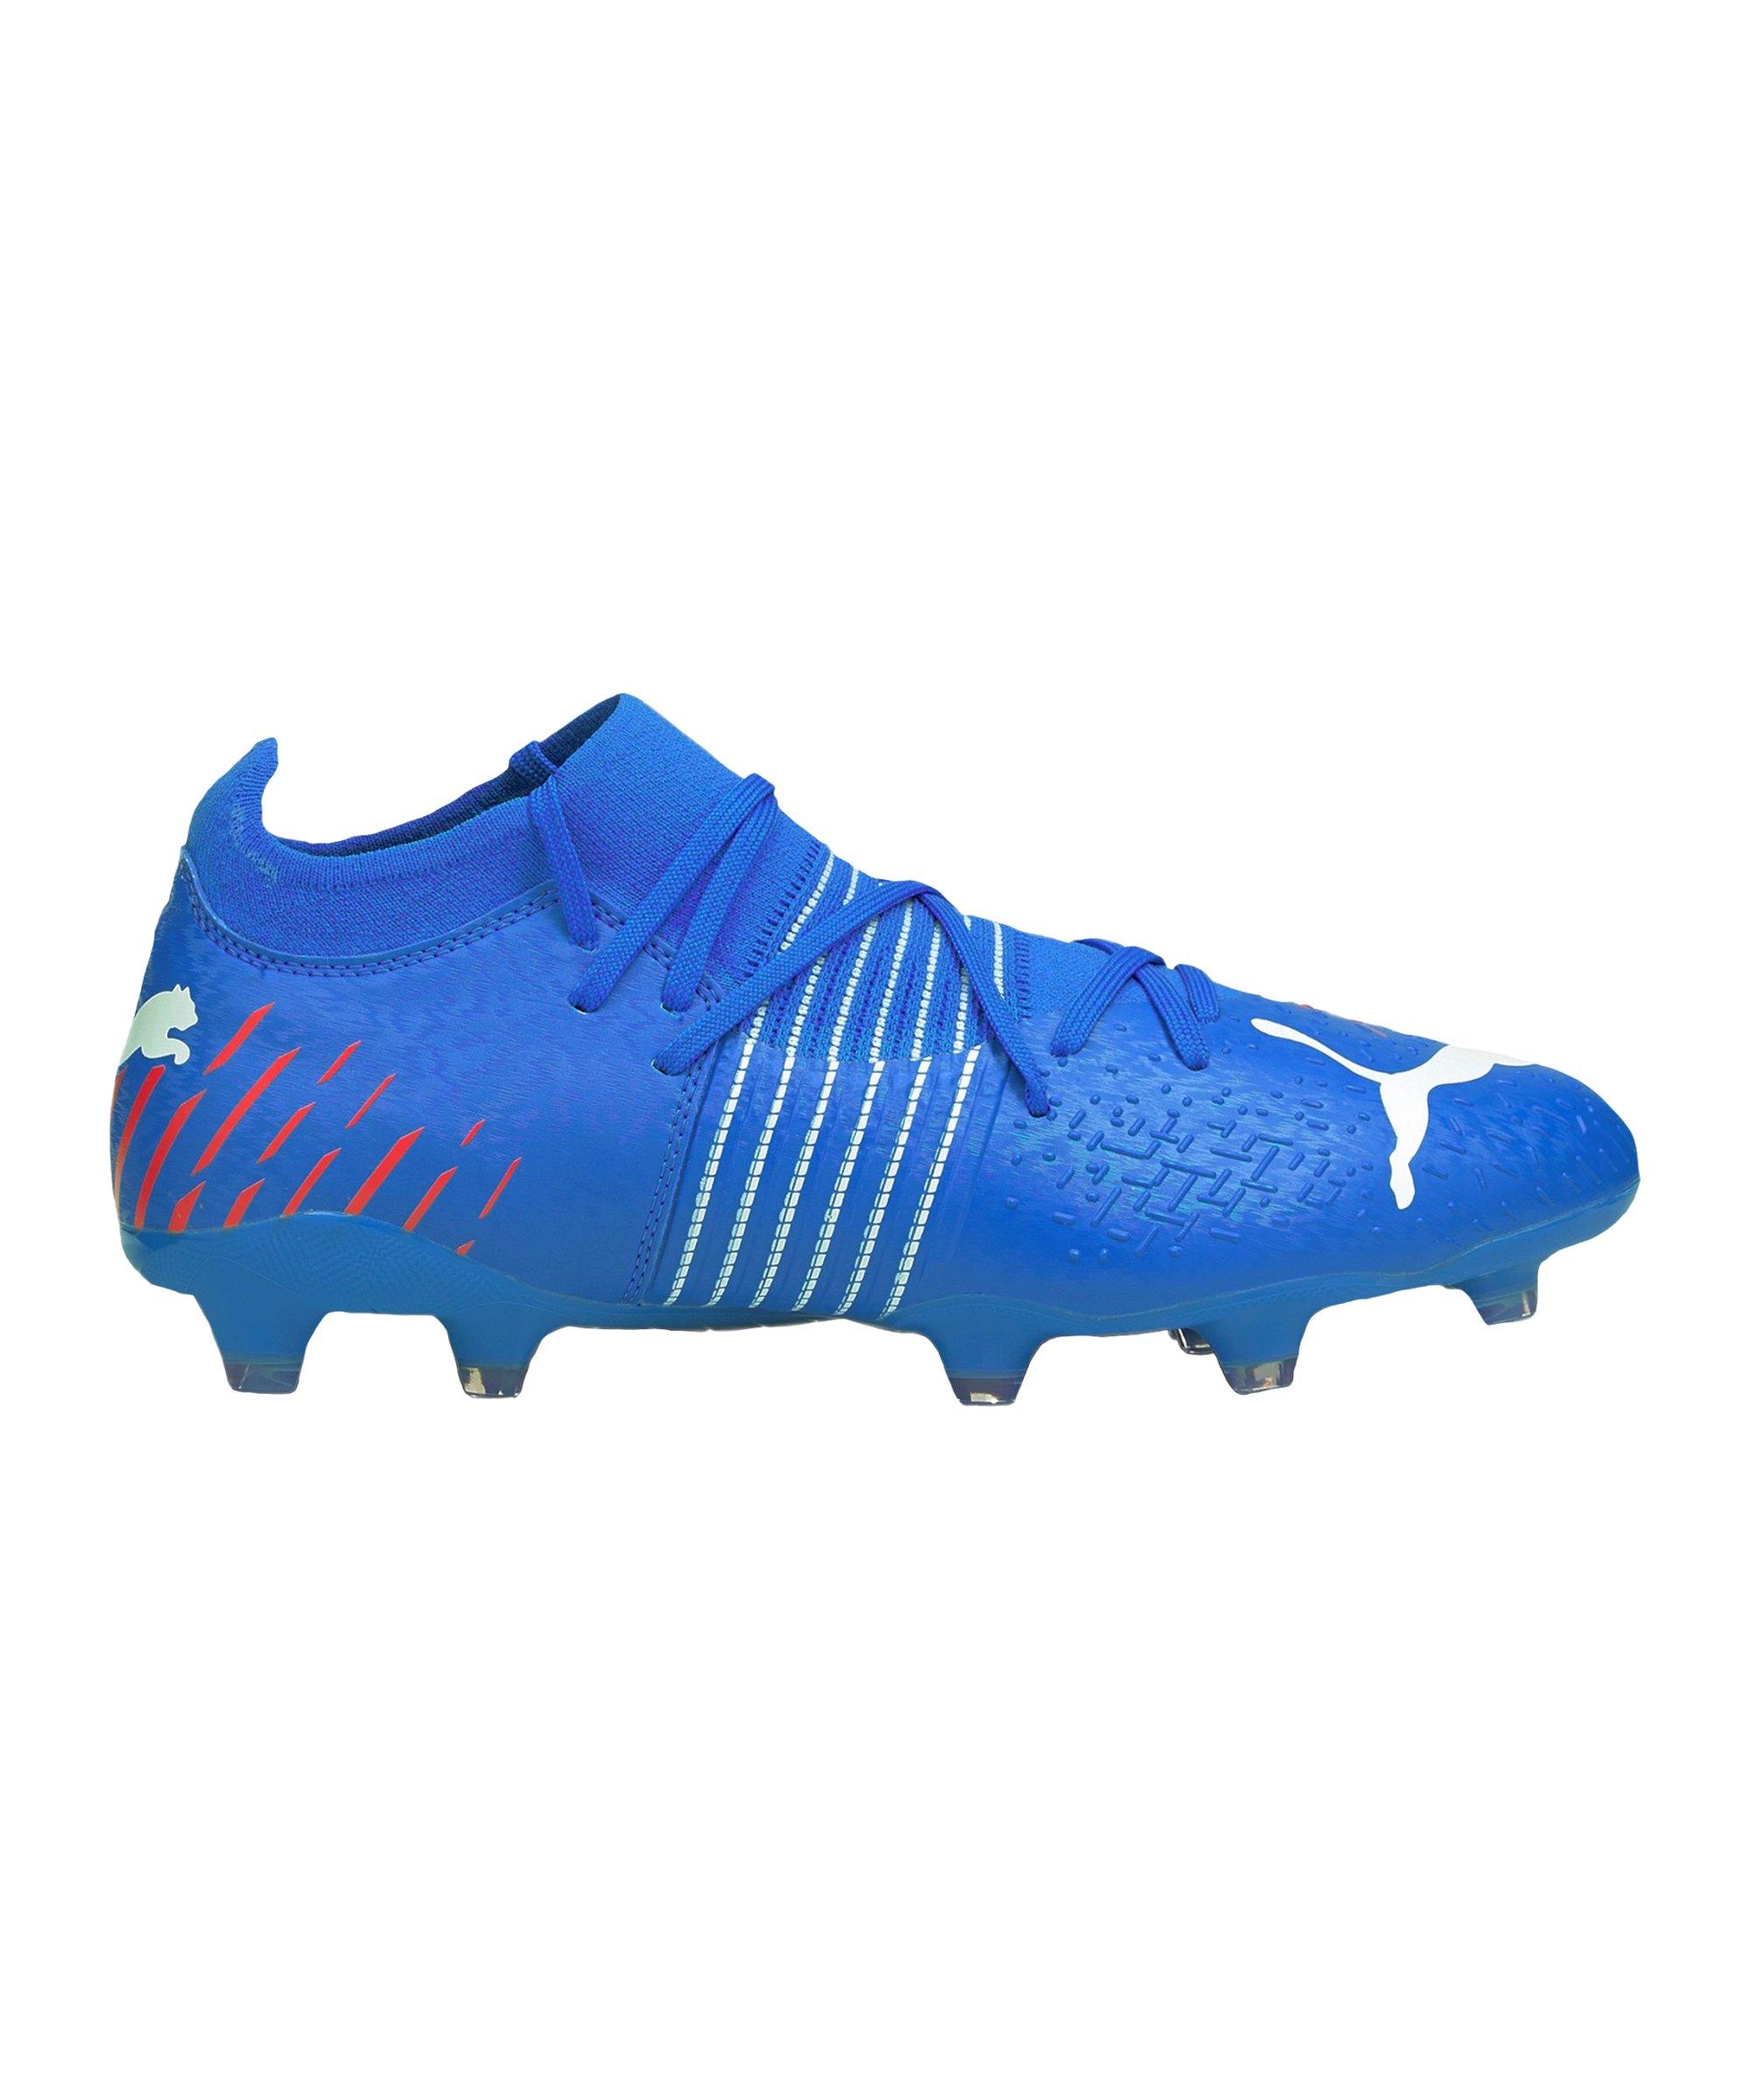 PUMA FUTURE Z 3.2 Faster Football FG/AG Blau Rot F01 - blau